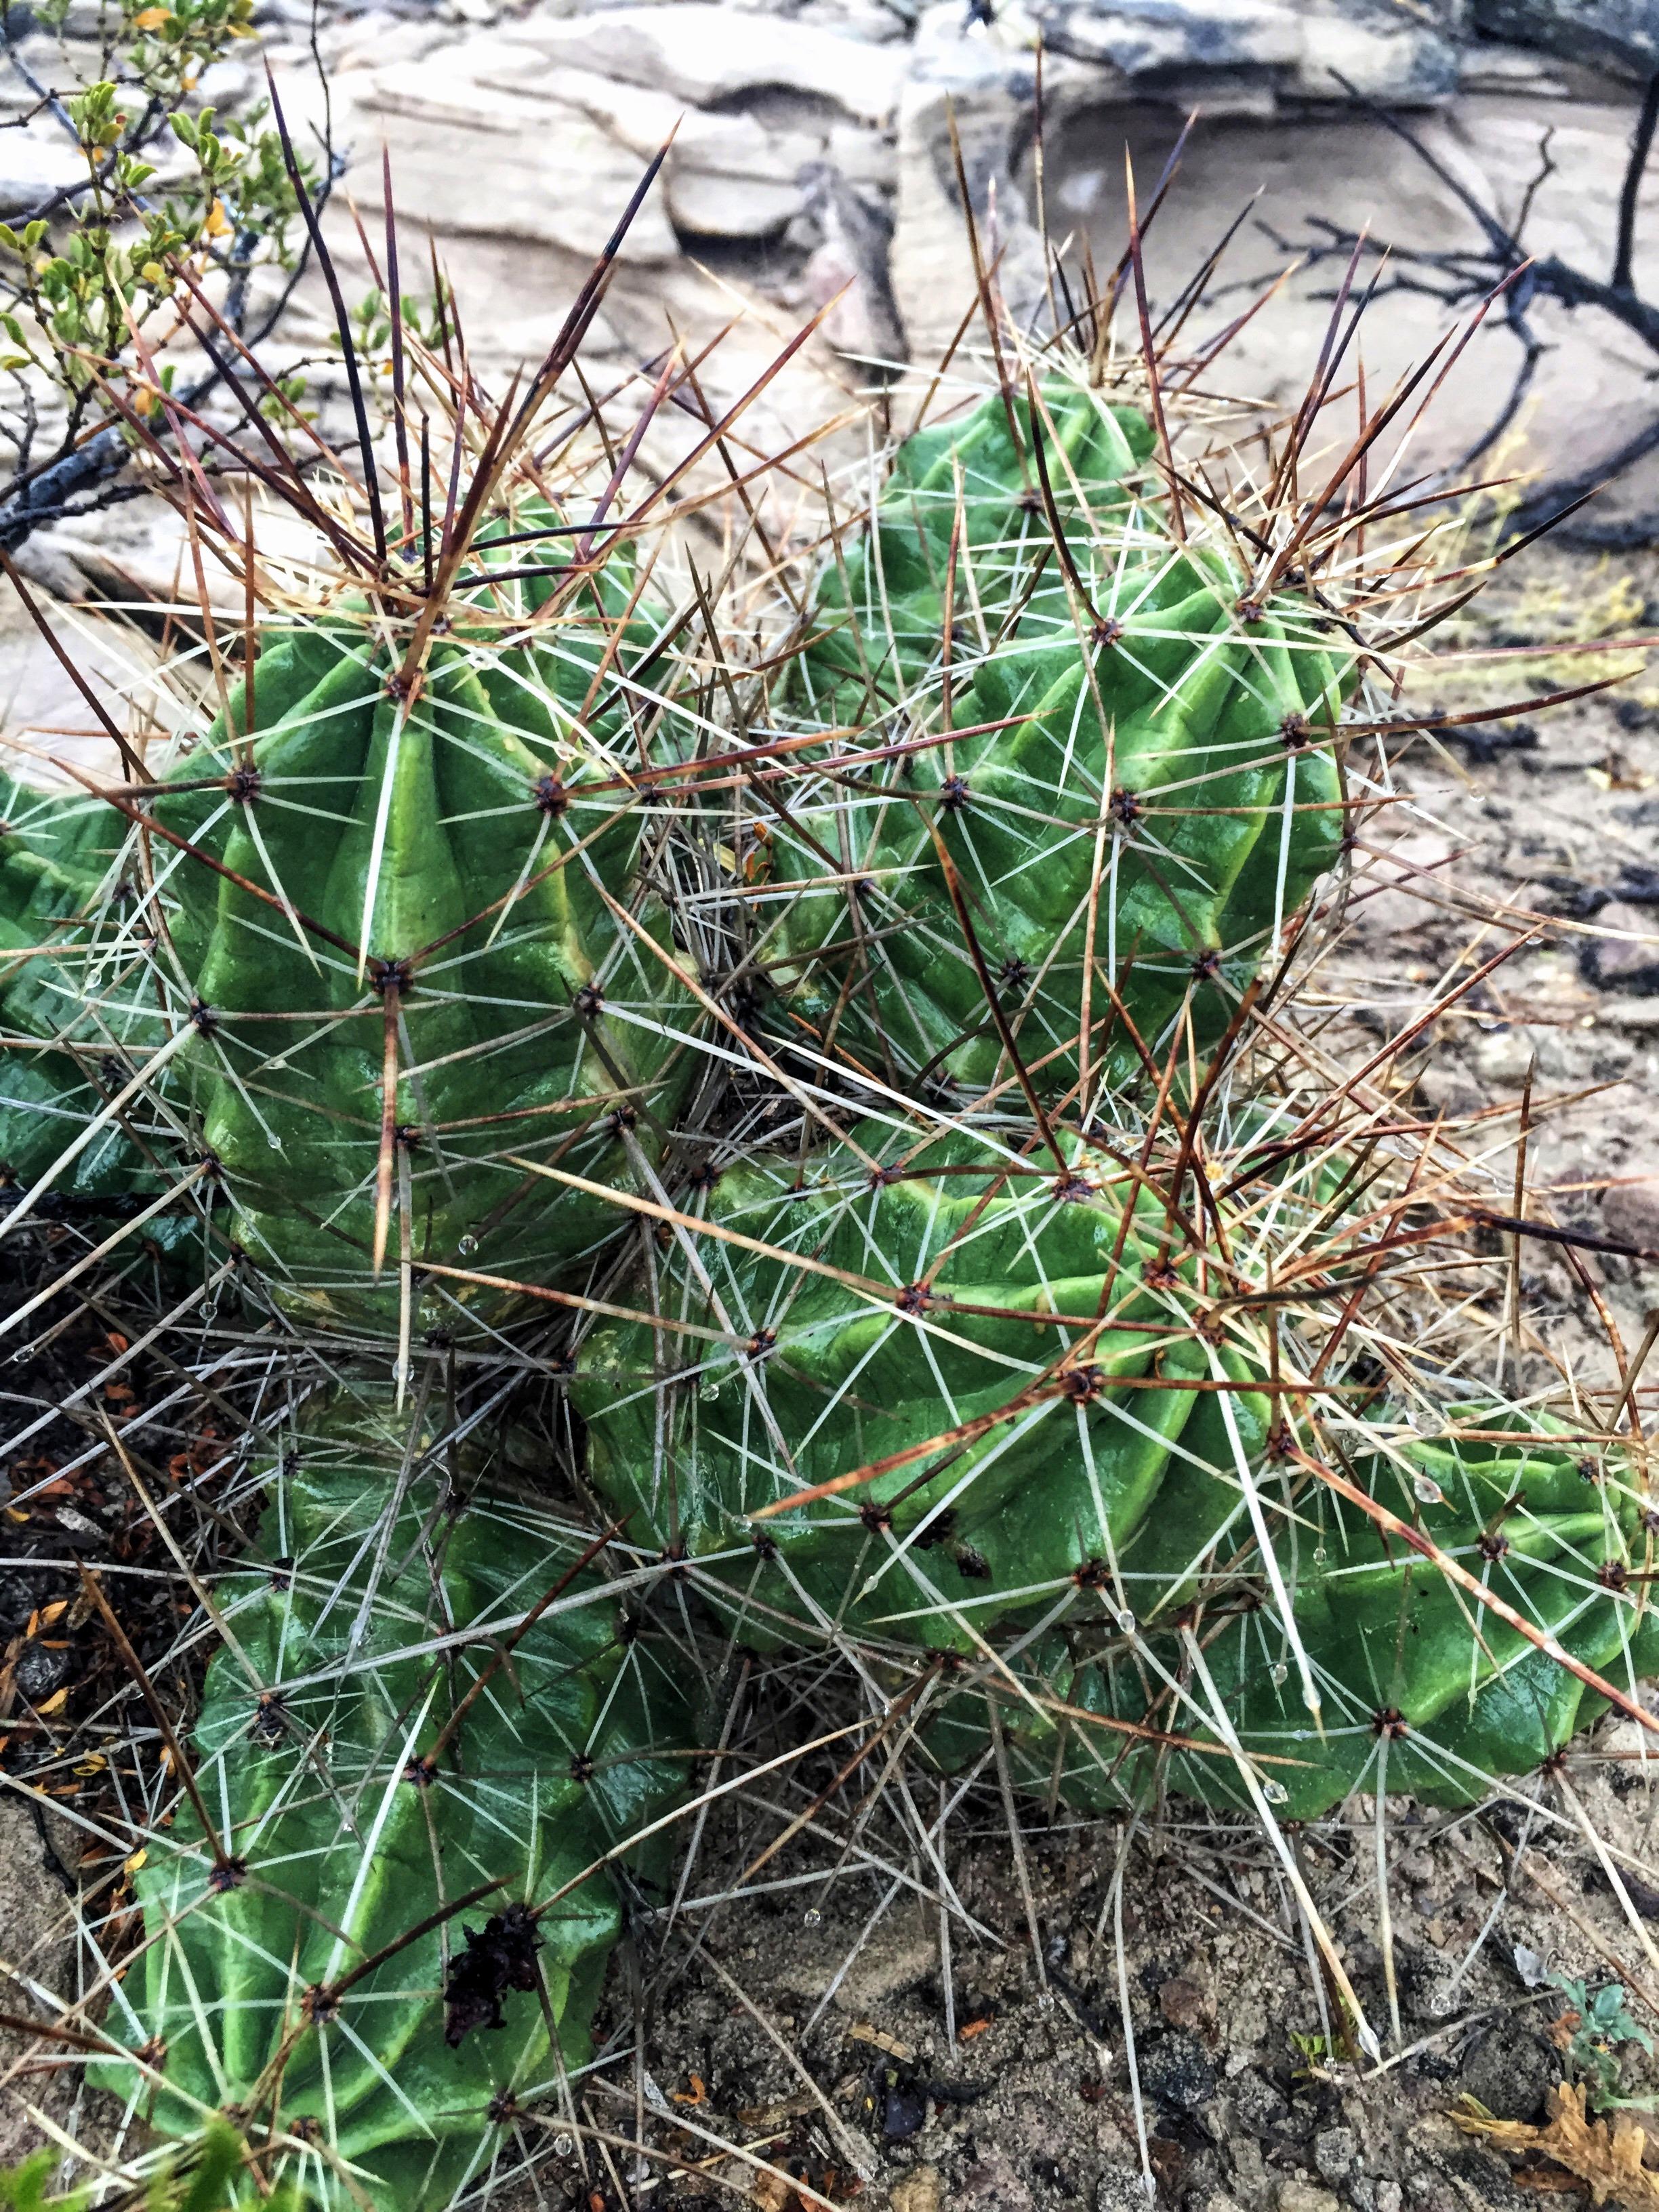 Echinocereus enneacanthus var. enneacanthus